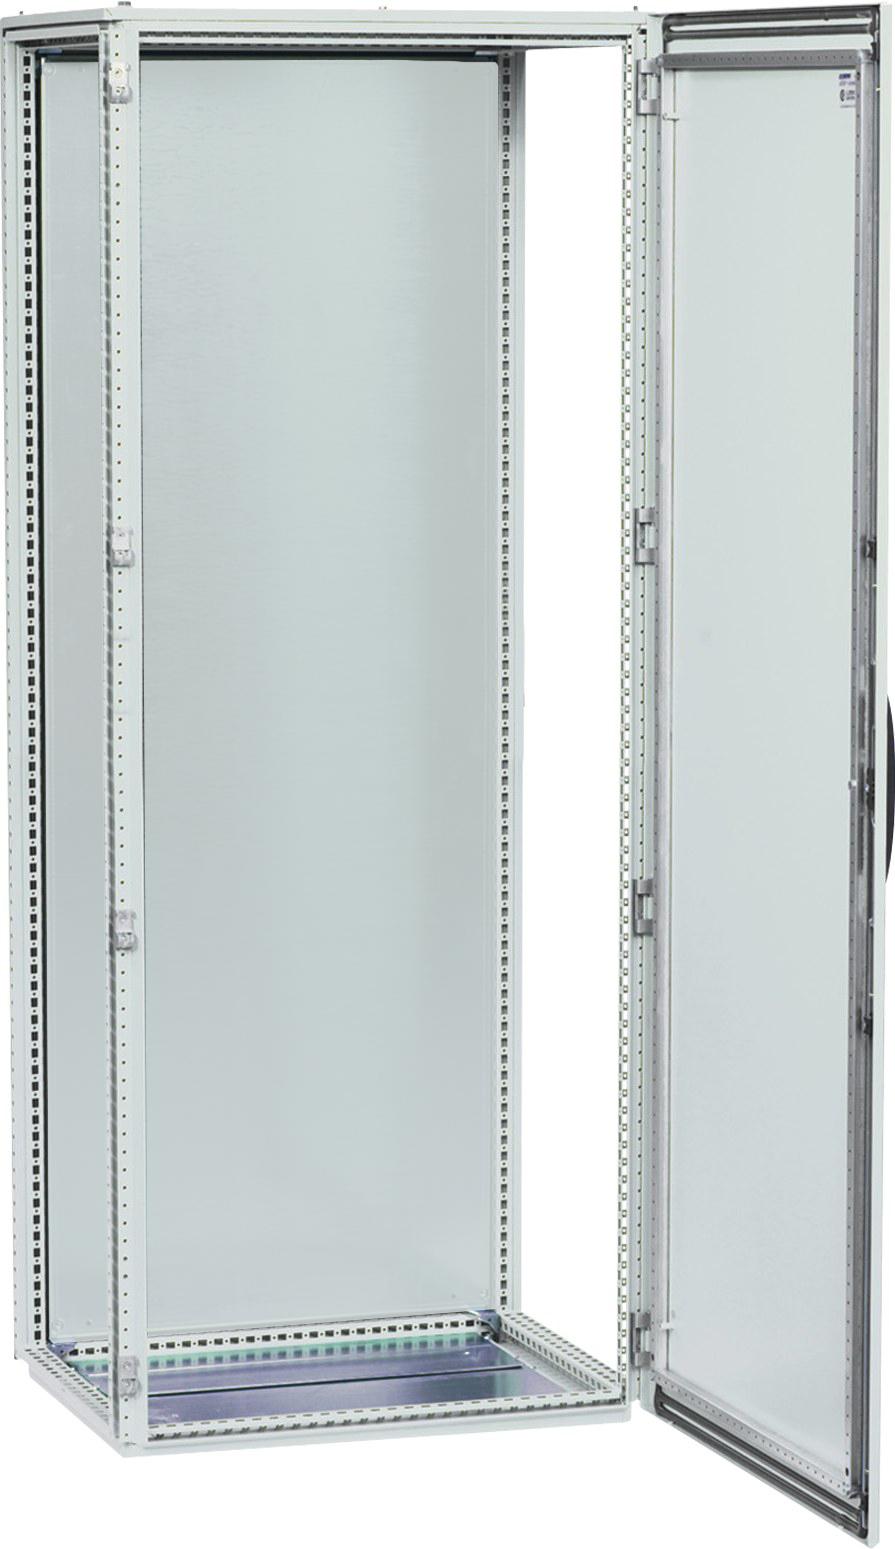 1 Stk Anreihschrank 1-türig, 2000x1000x400mm, RAL 7035 AS201041-5